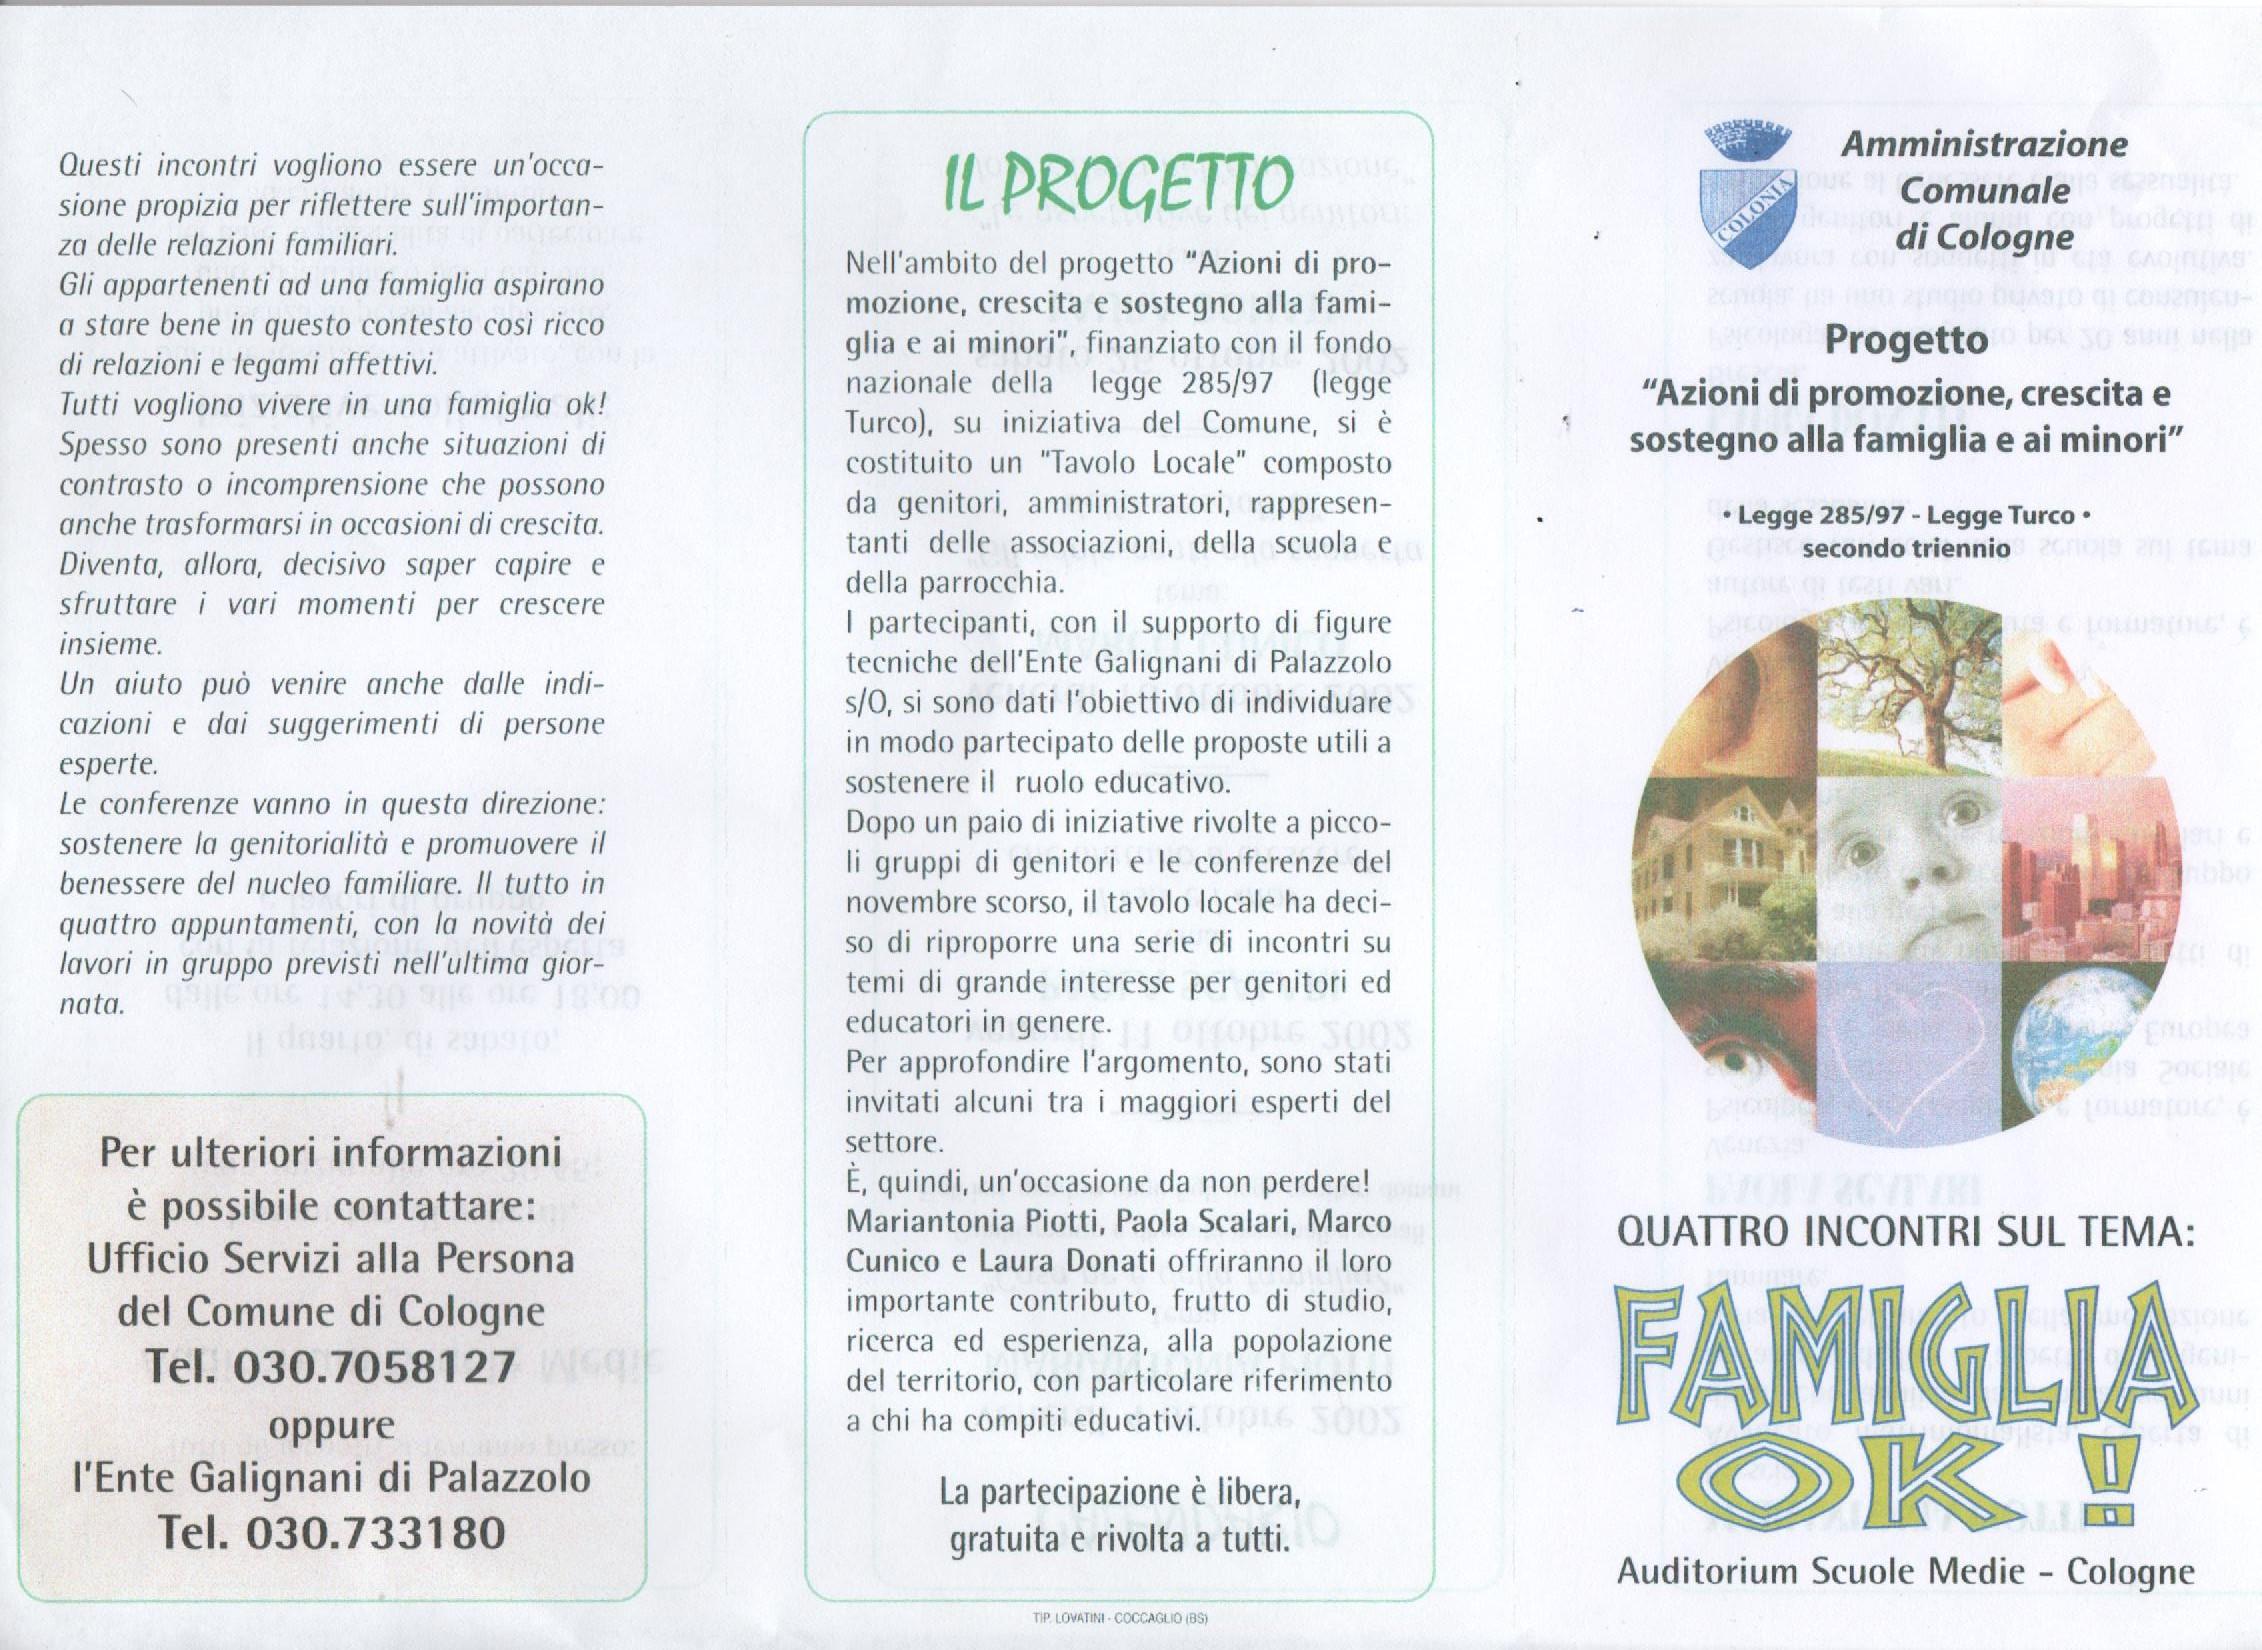 FAMIGLIA-OK!1